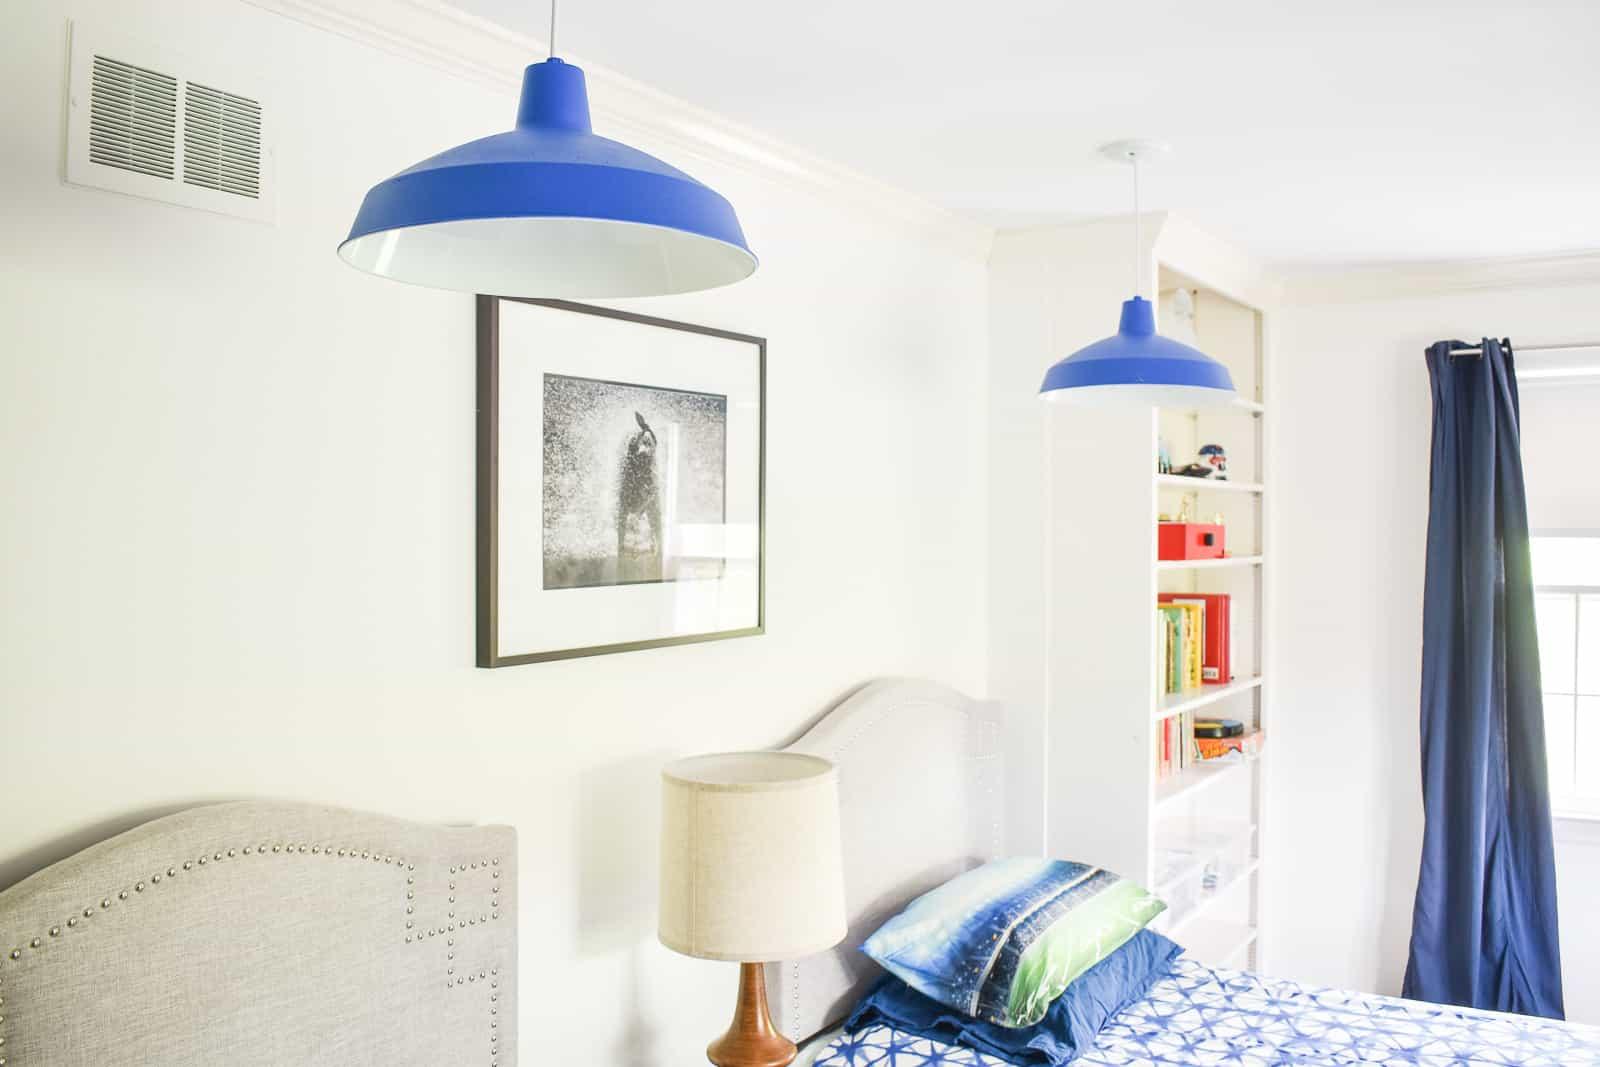 spray painted blue pendant lights